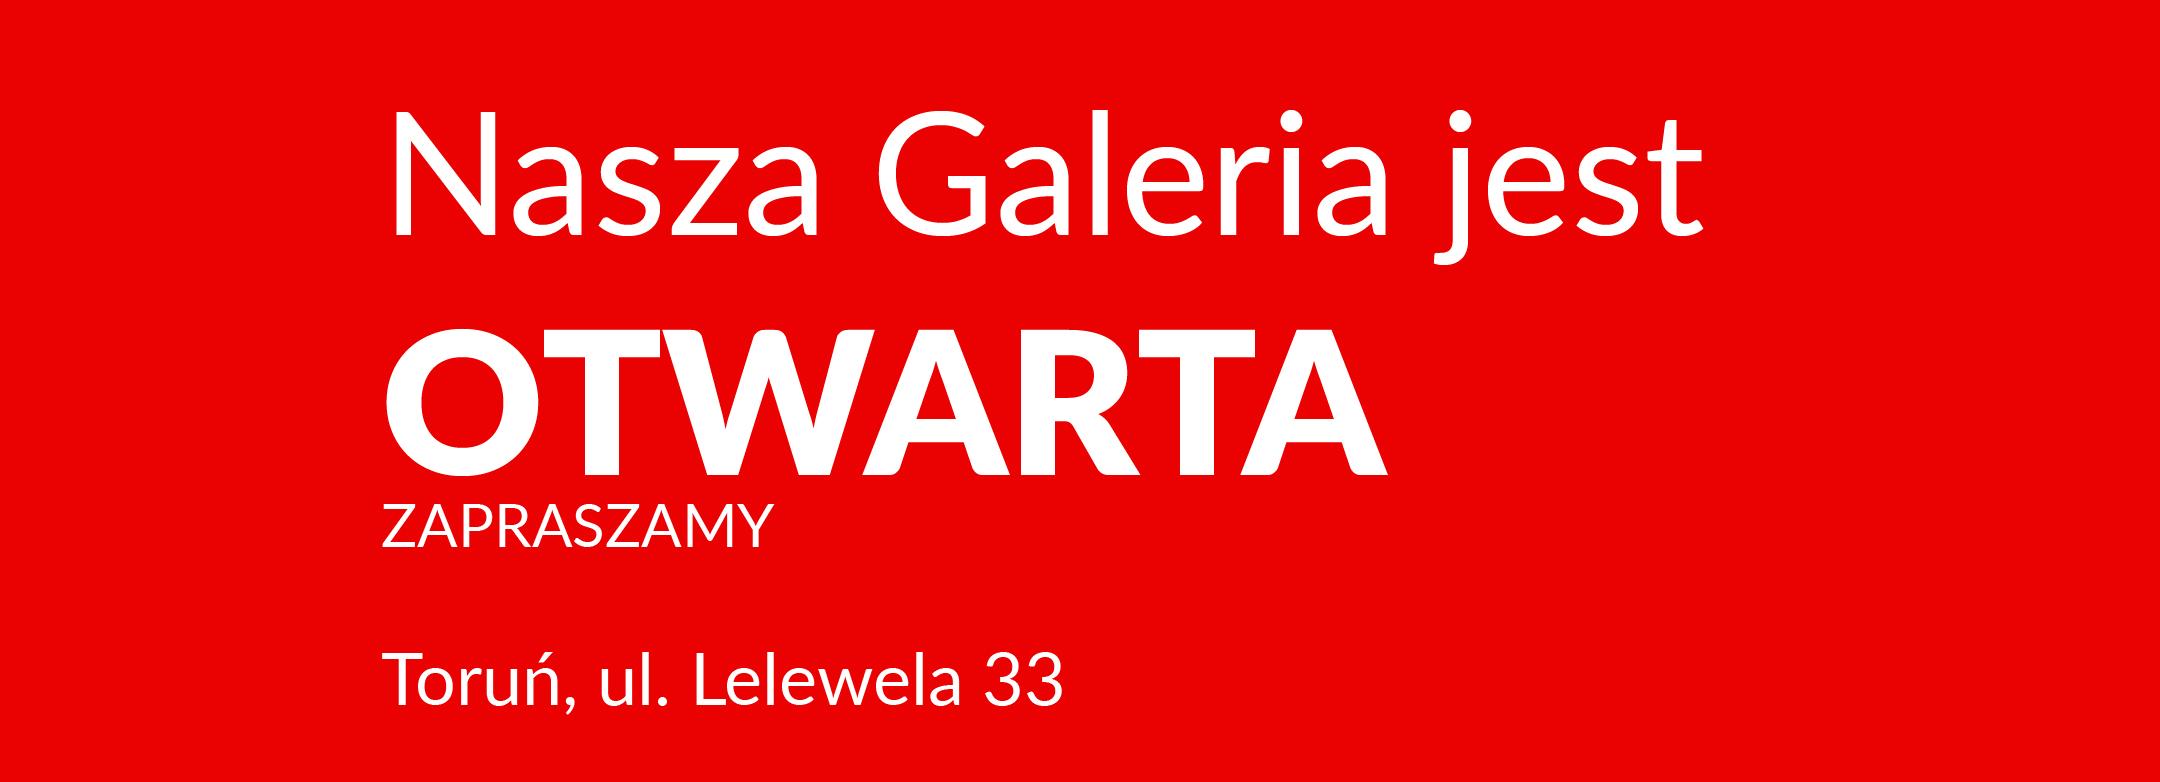 glaeria-otwarta-w-tle